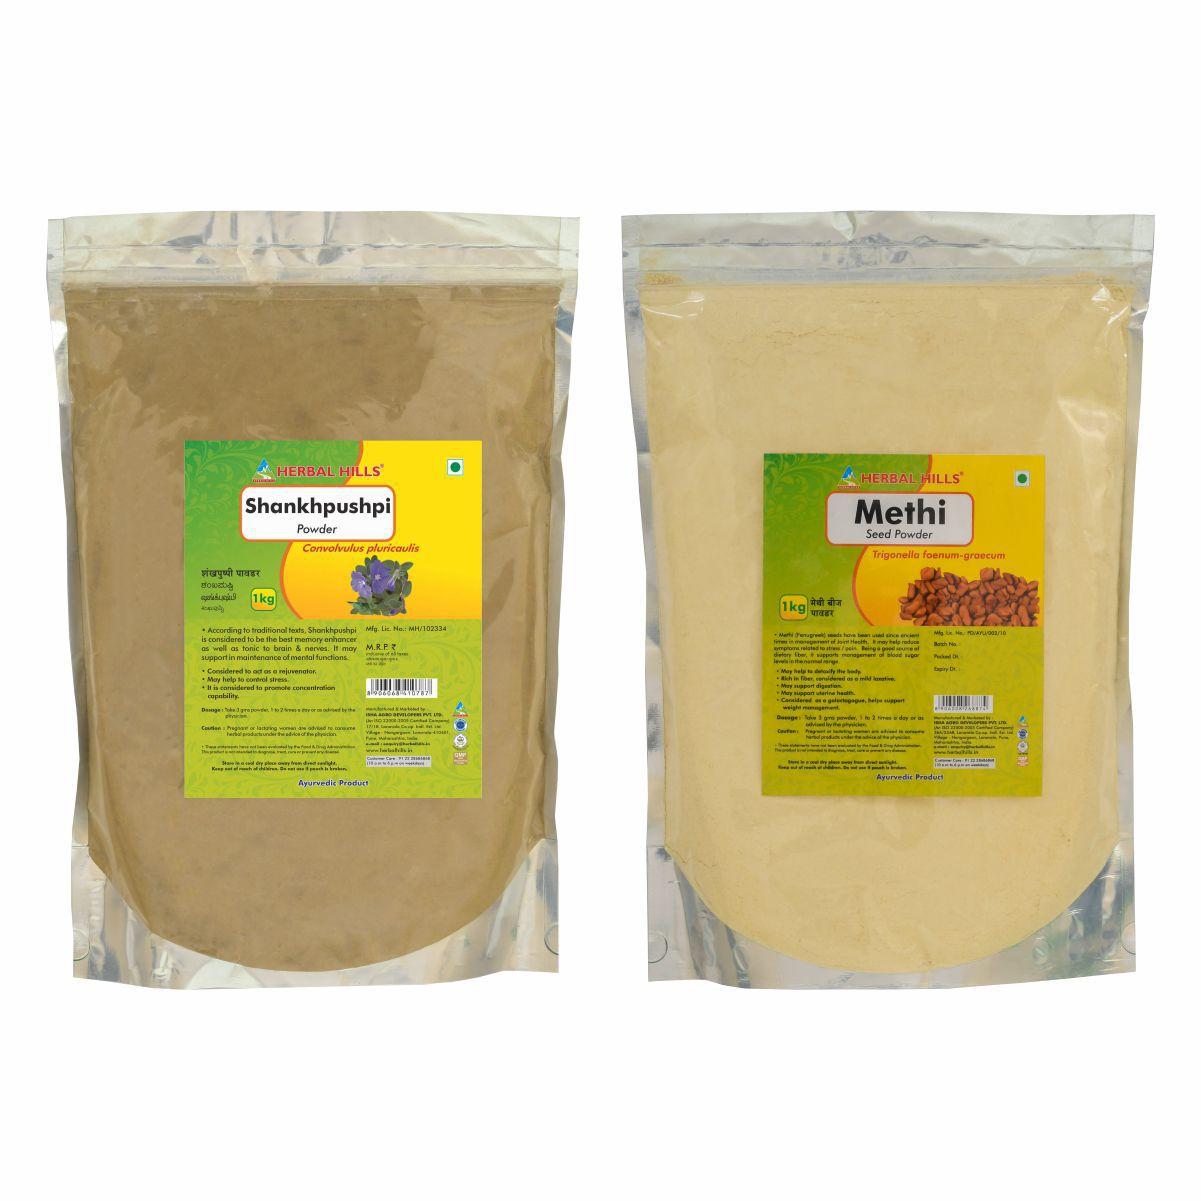 Herbal Hills Shankhpushpi and Methi Seed Powder 1 kg Pack Of 2